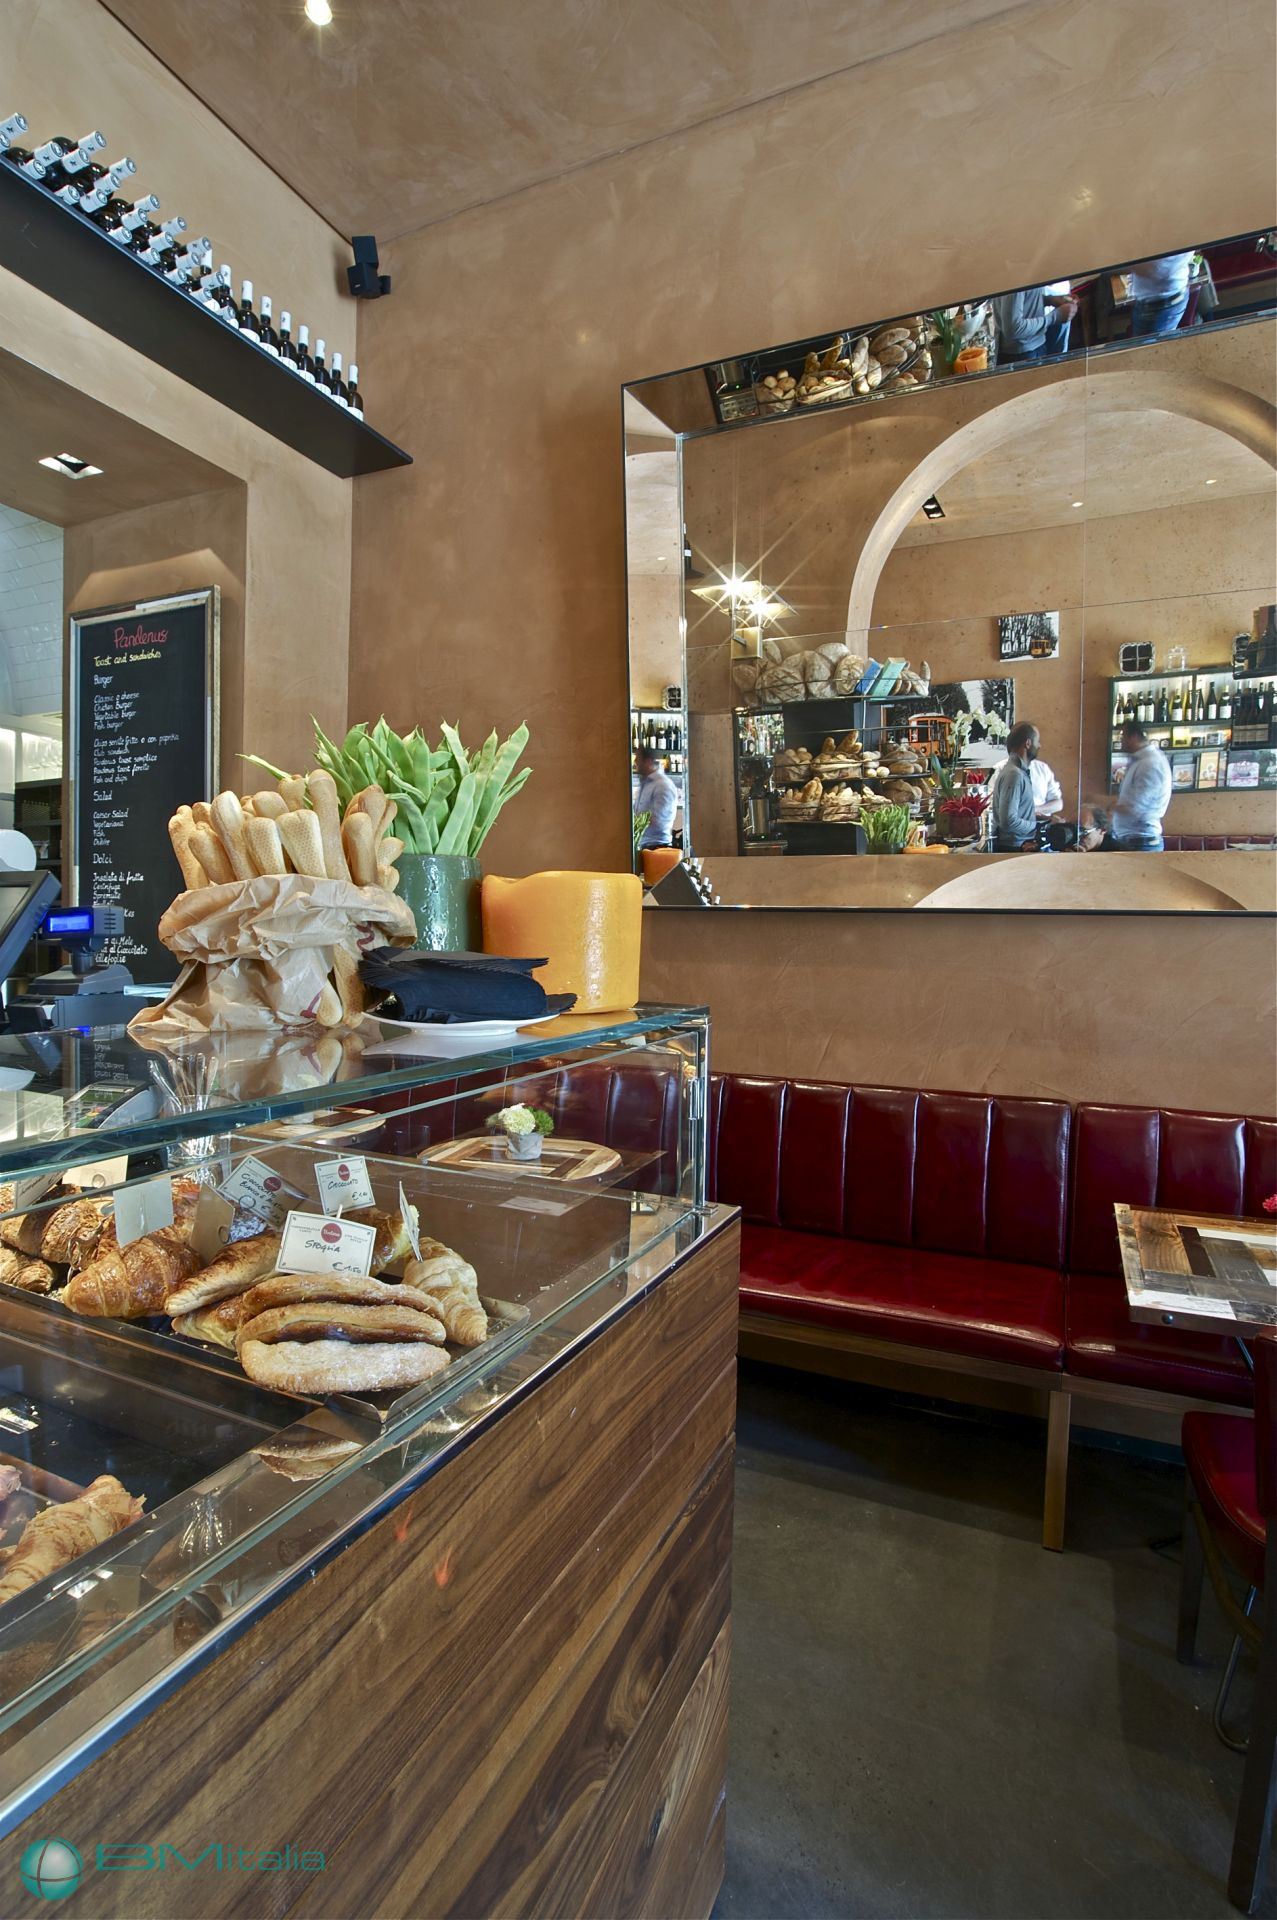 Arredamenti per locali pubblici panetterie bar caffetterie for Arredamenti per panetterie